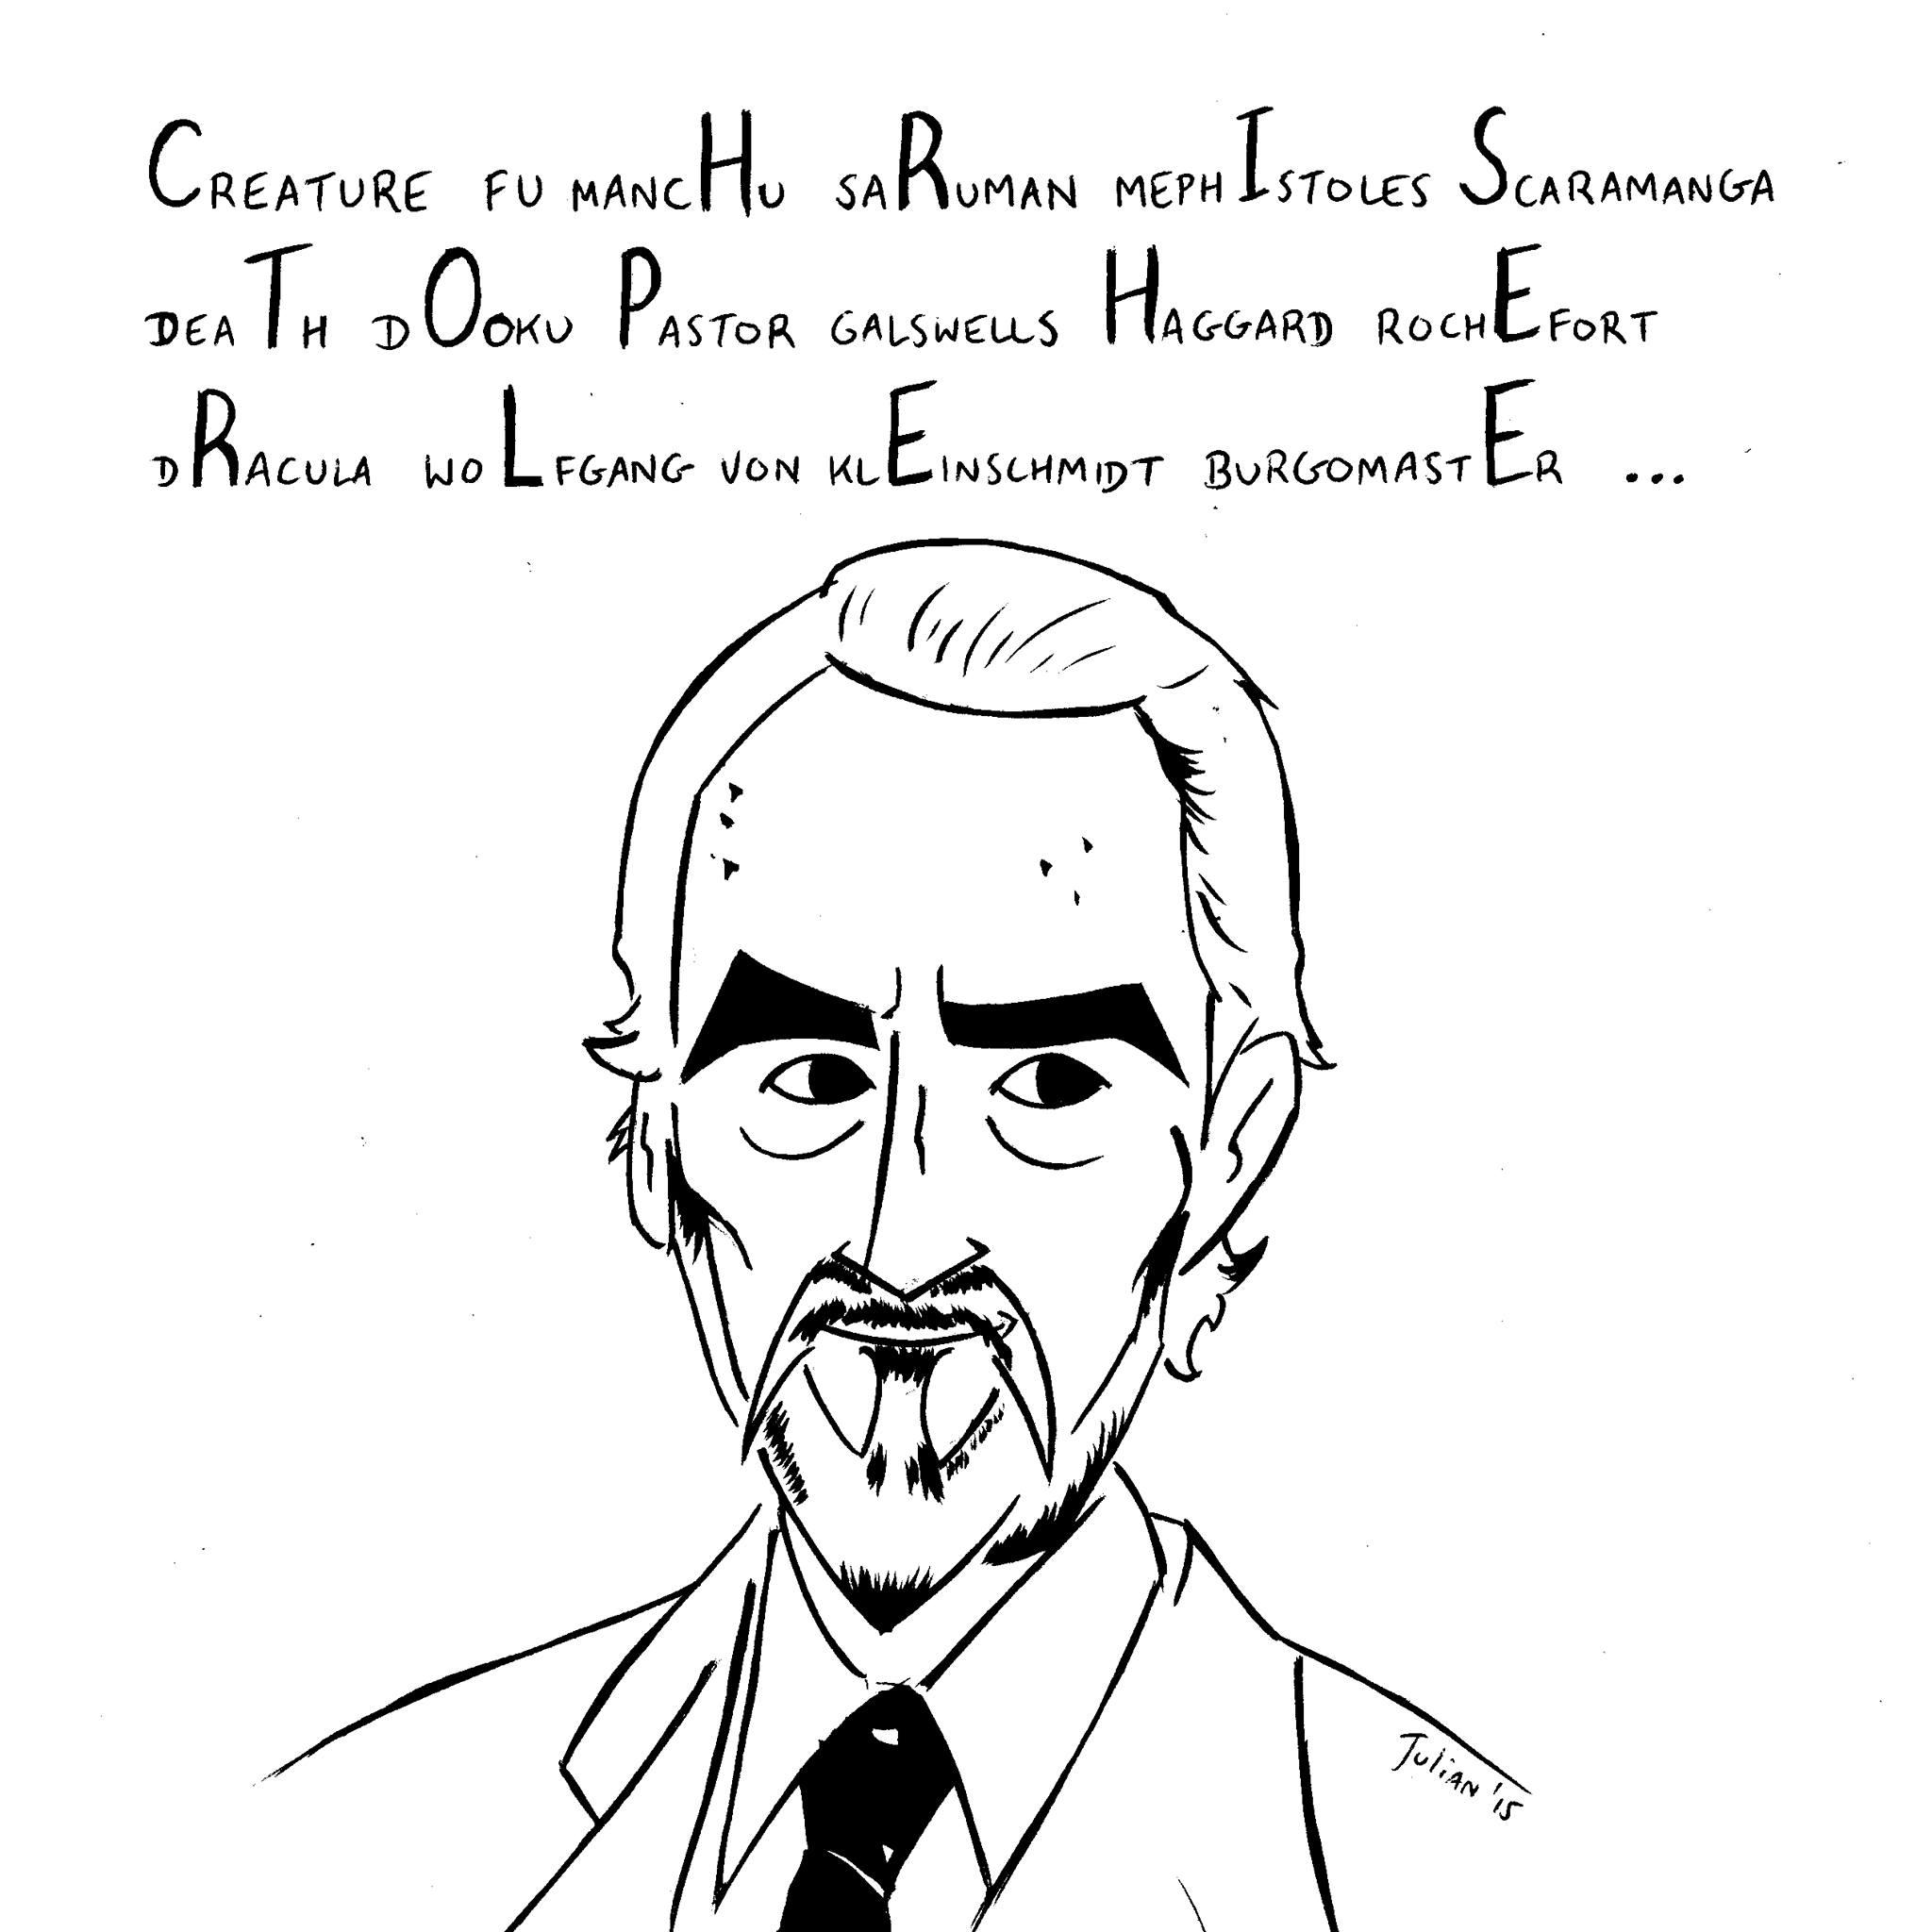 Prince alan rickman david bowie